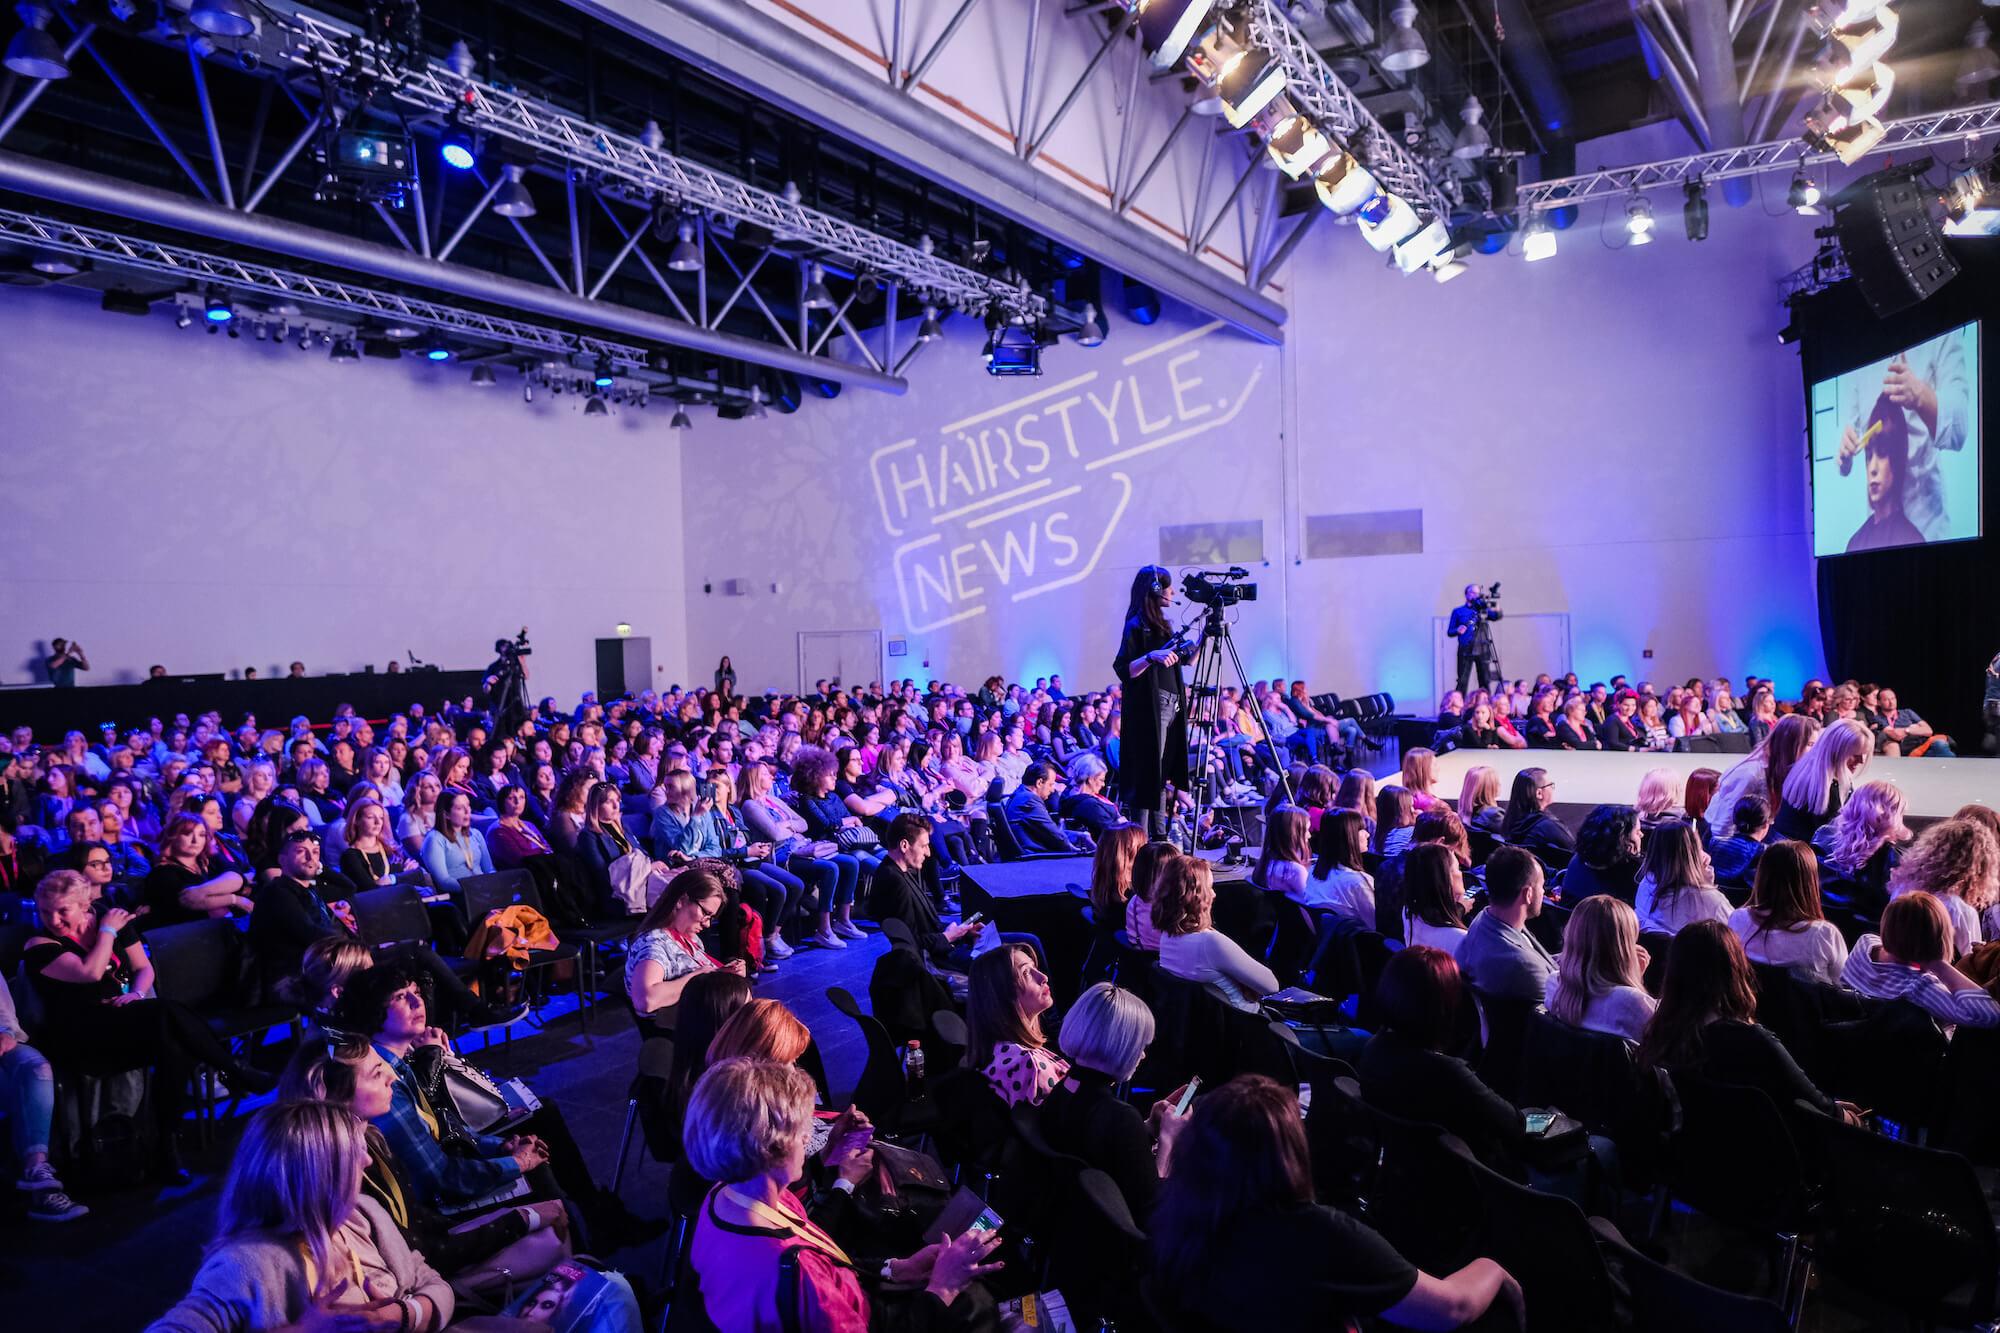 Frizerski festival Hairstyle news 2020 - Zagreb